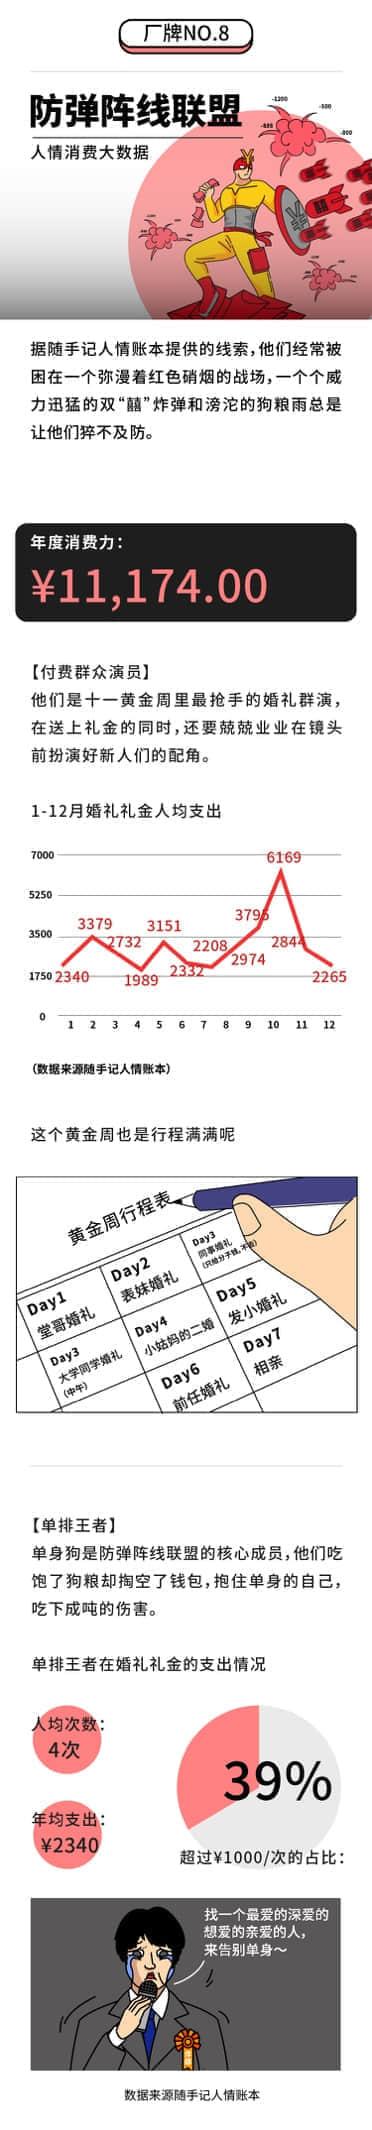 /Users/shaojuanhuang/Desktop/大数据报告V2/厂牌/厂牌-08-防弹阵线联盟.jpeg